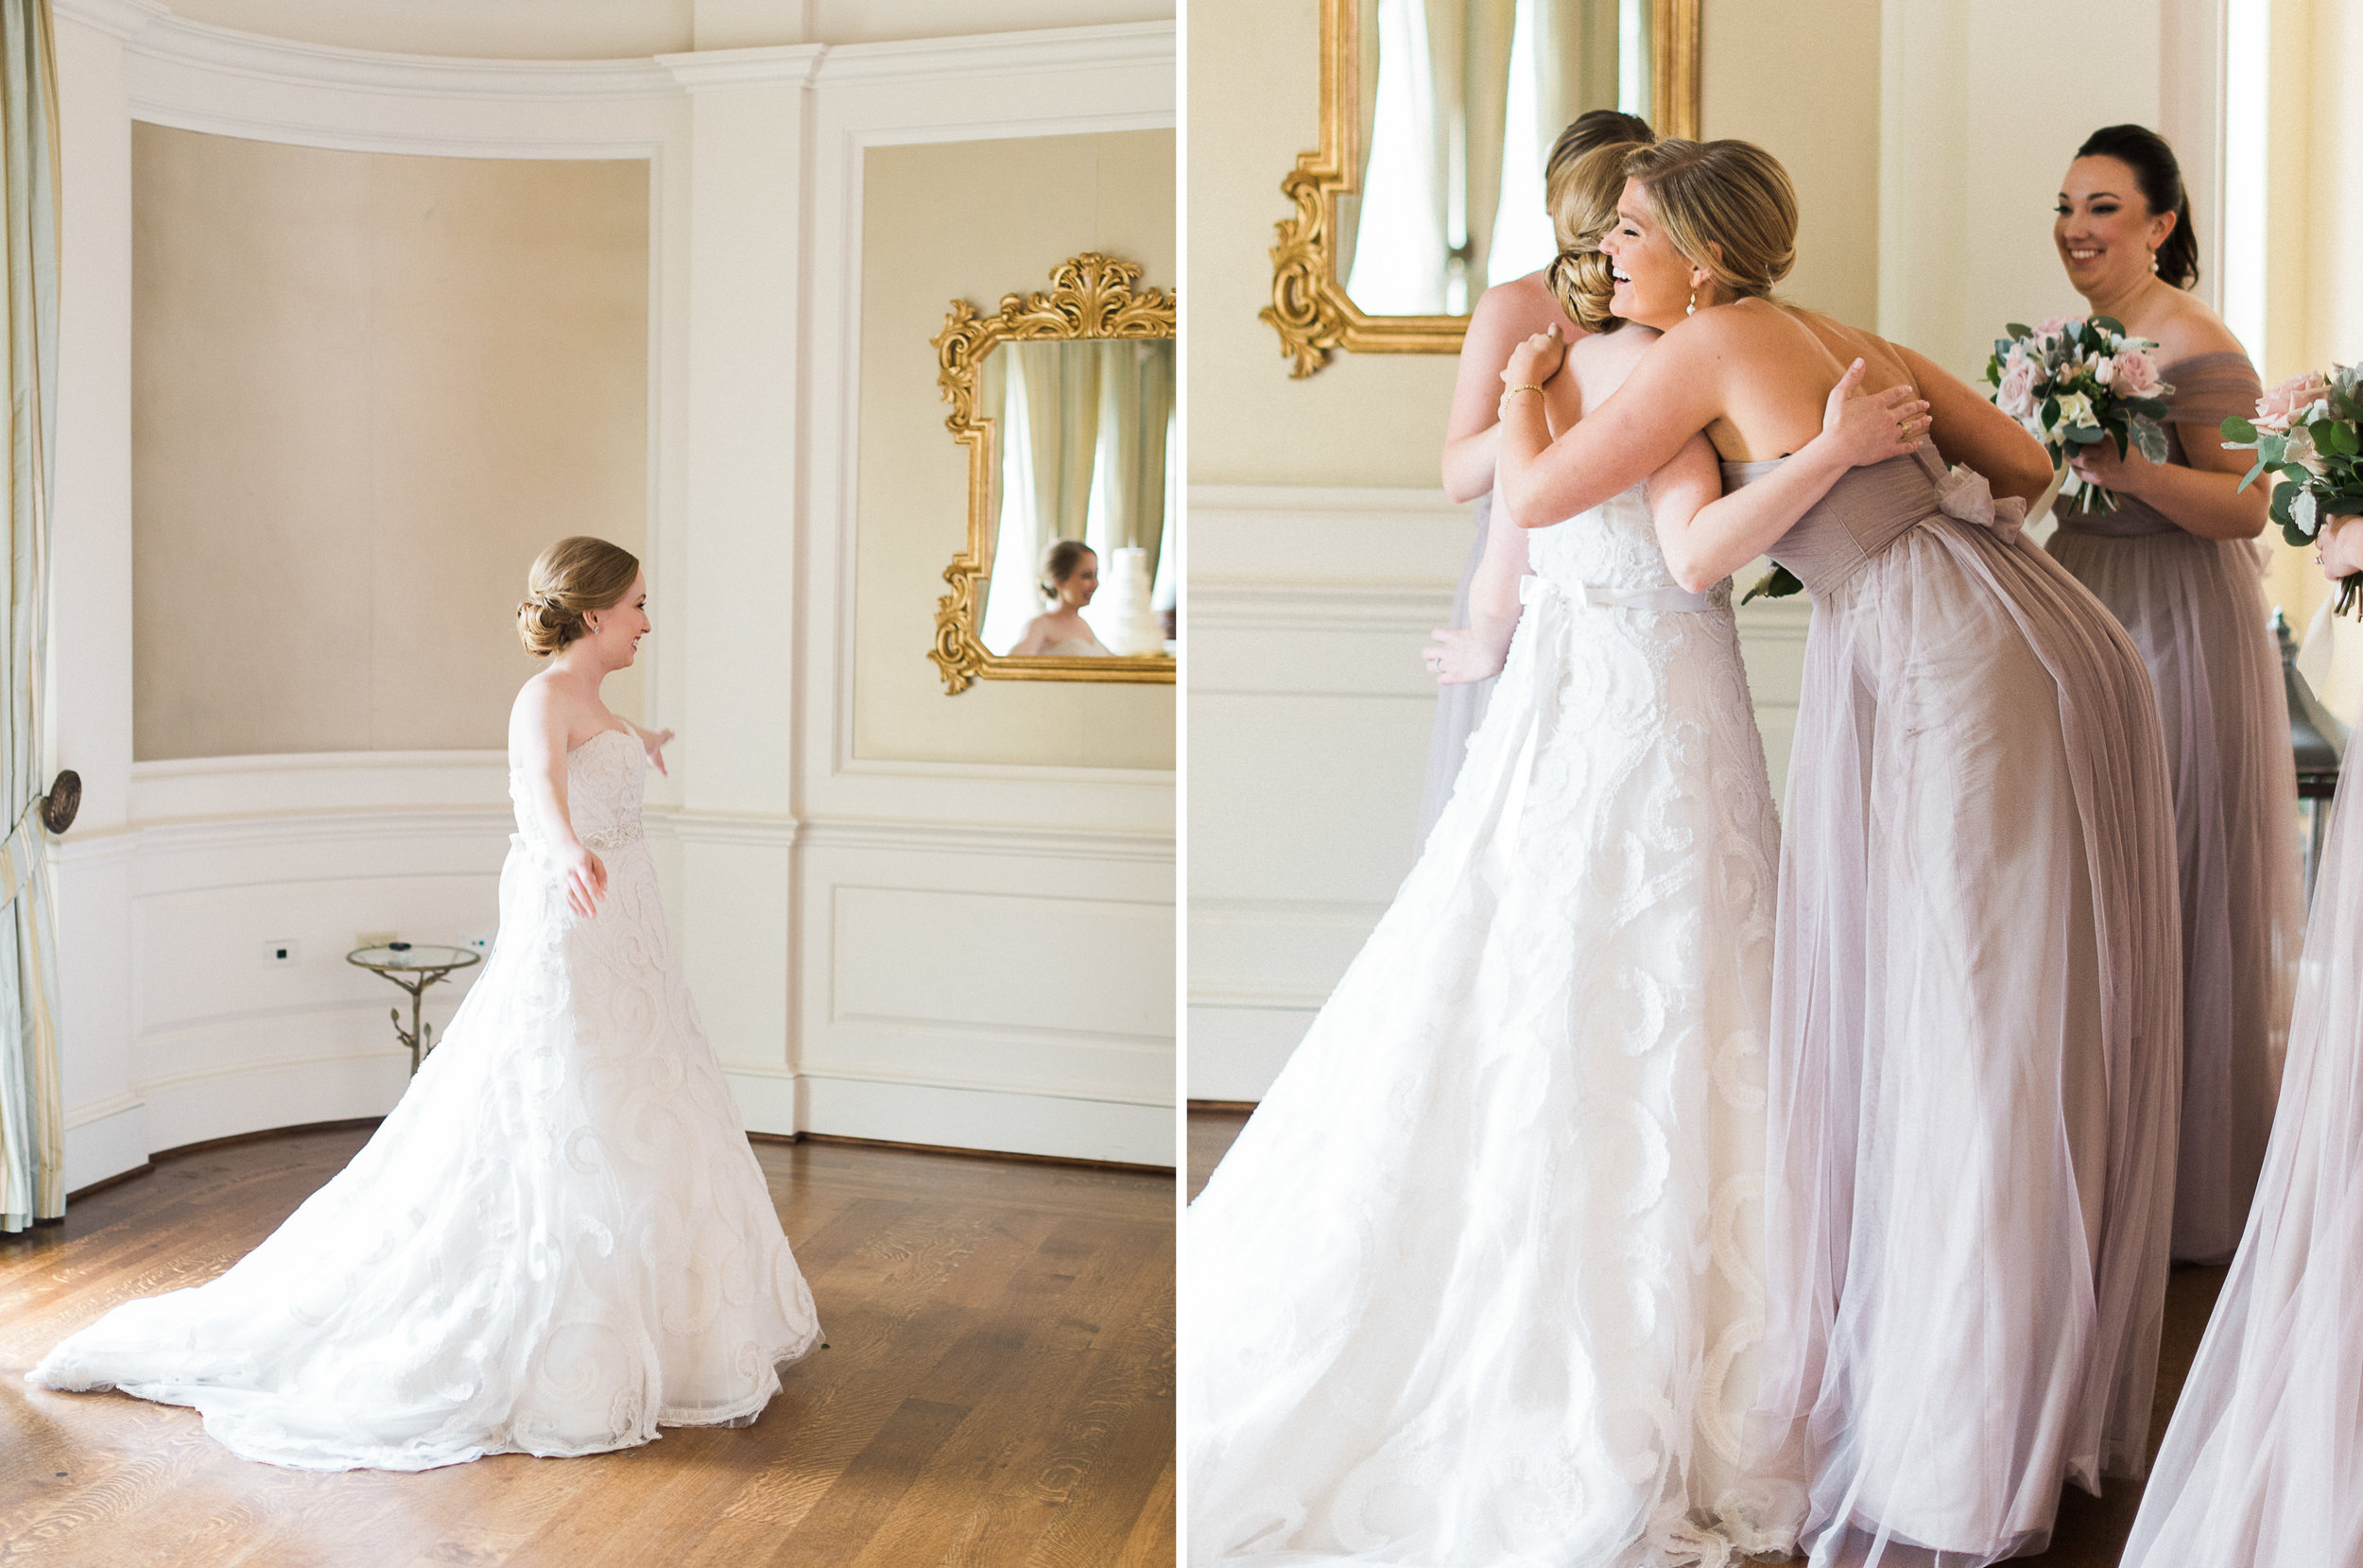 Fine-Art-Film-Houston-Wedding-Photographer-Best-Top-Luxury-Texas-Austin-Dallas-Destination-Dana-Fernandez-Photography-River-Oaks-Country-Club-South-Main-Baptist-Ceremony-Reception-Wedding-102.jpg